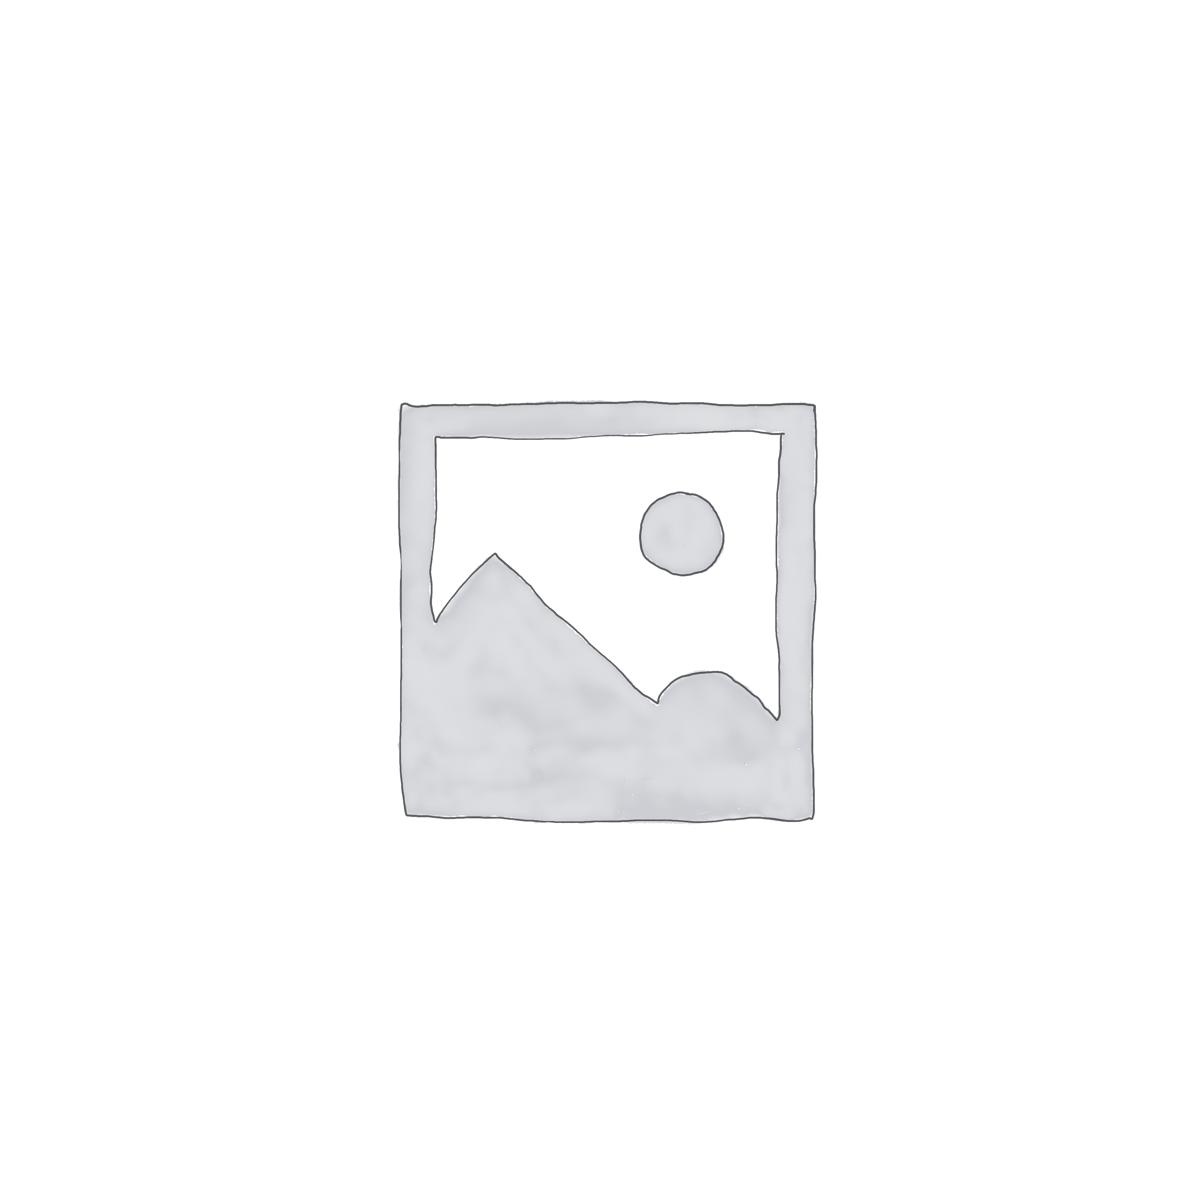 Colorful Blossoms Wallpaper Mural